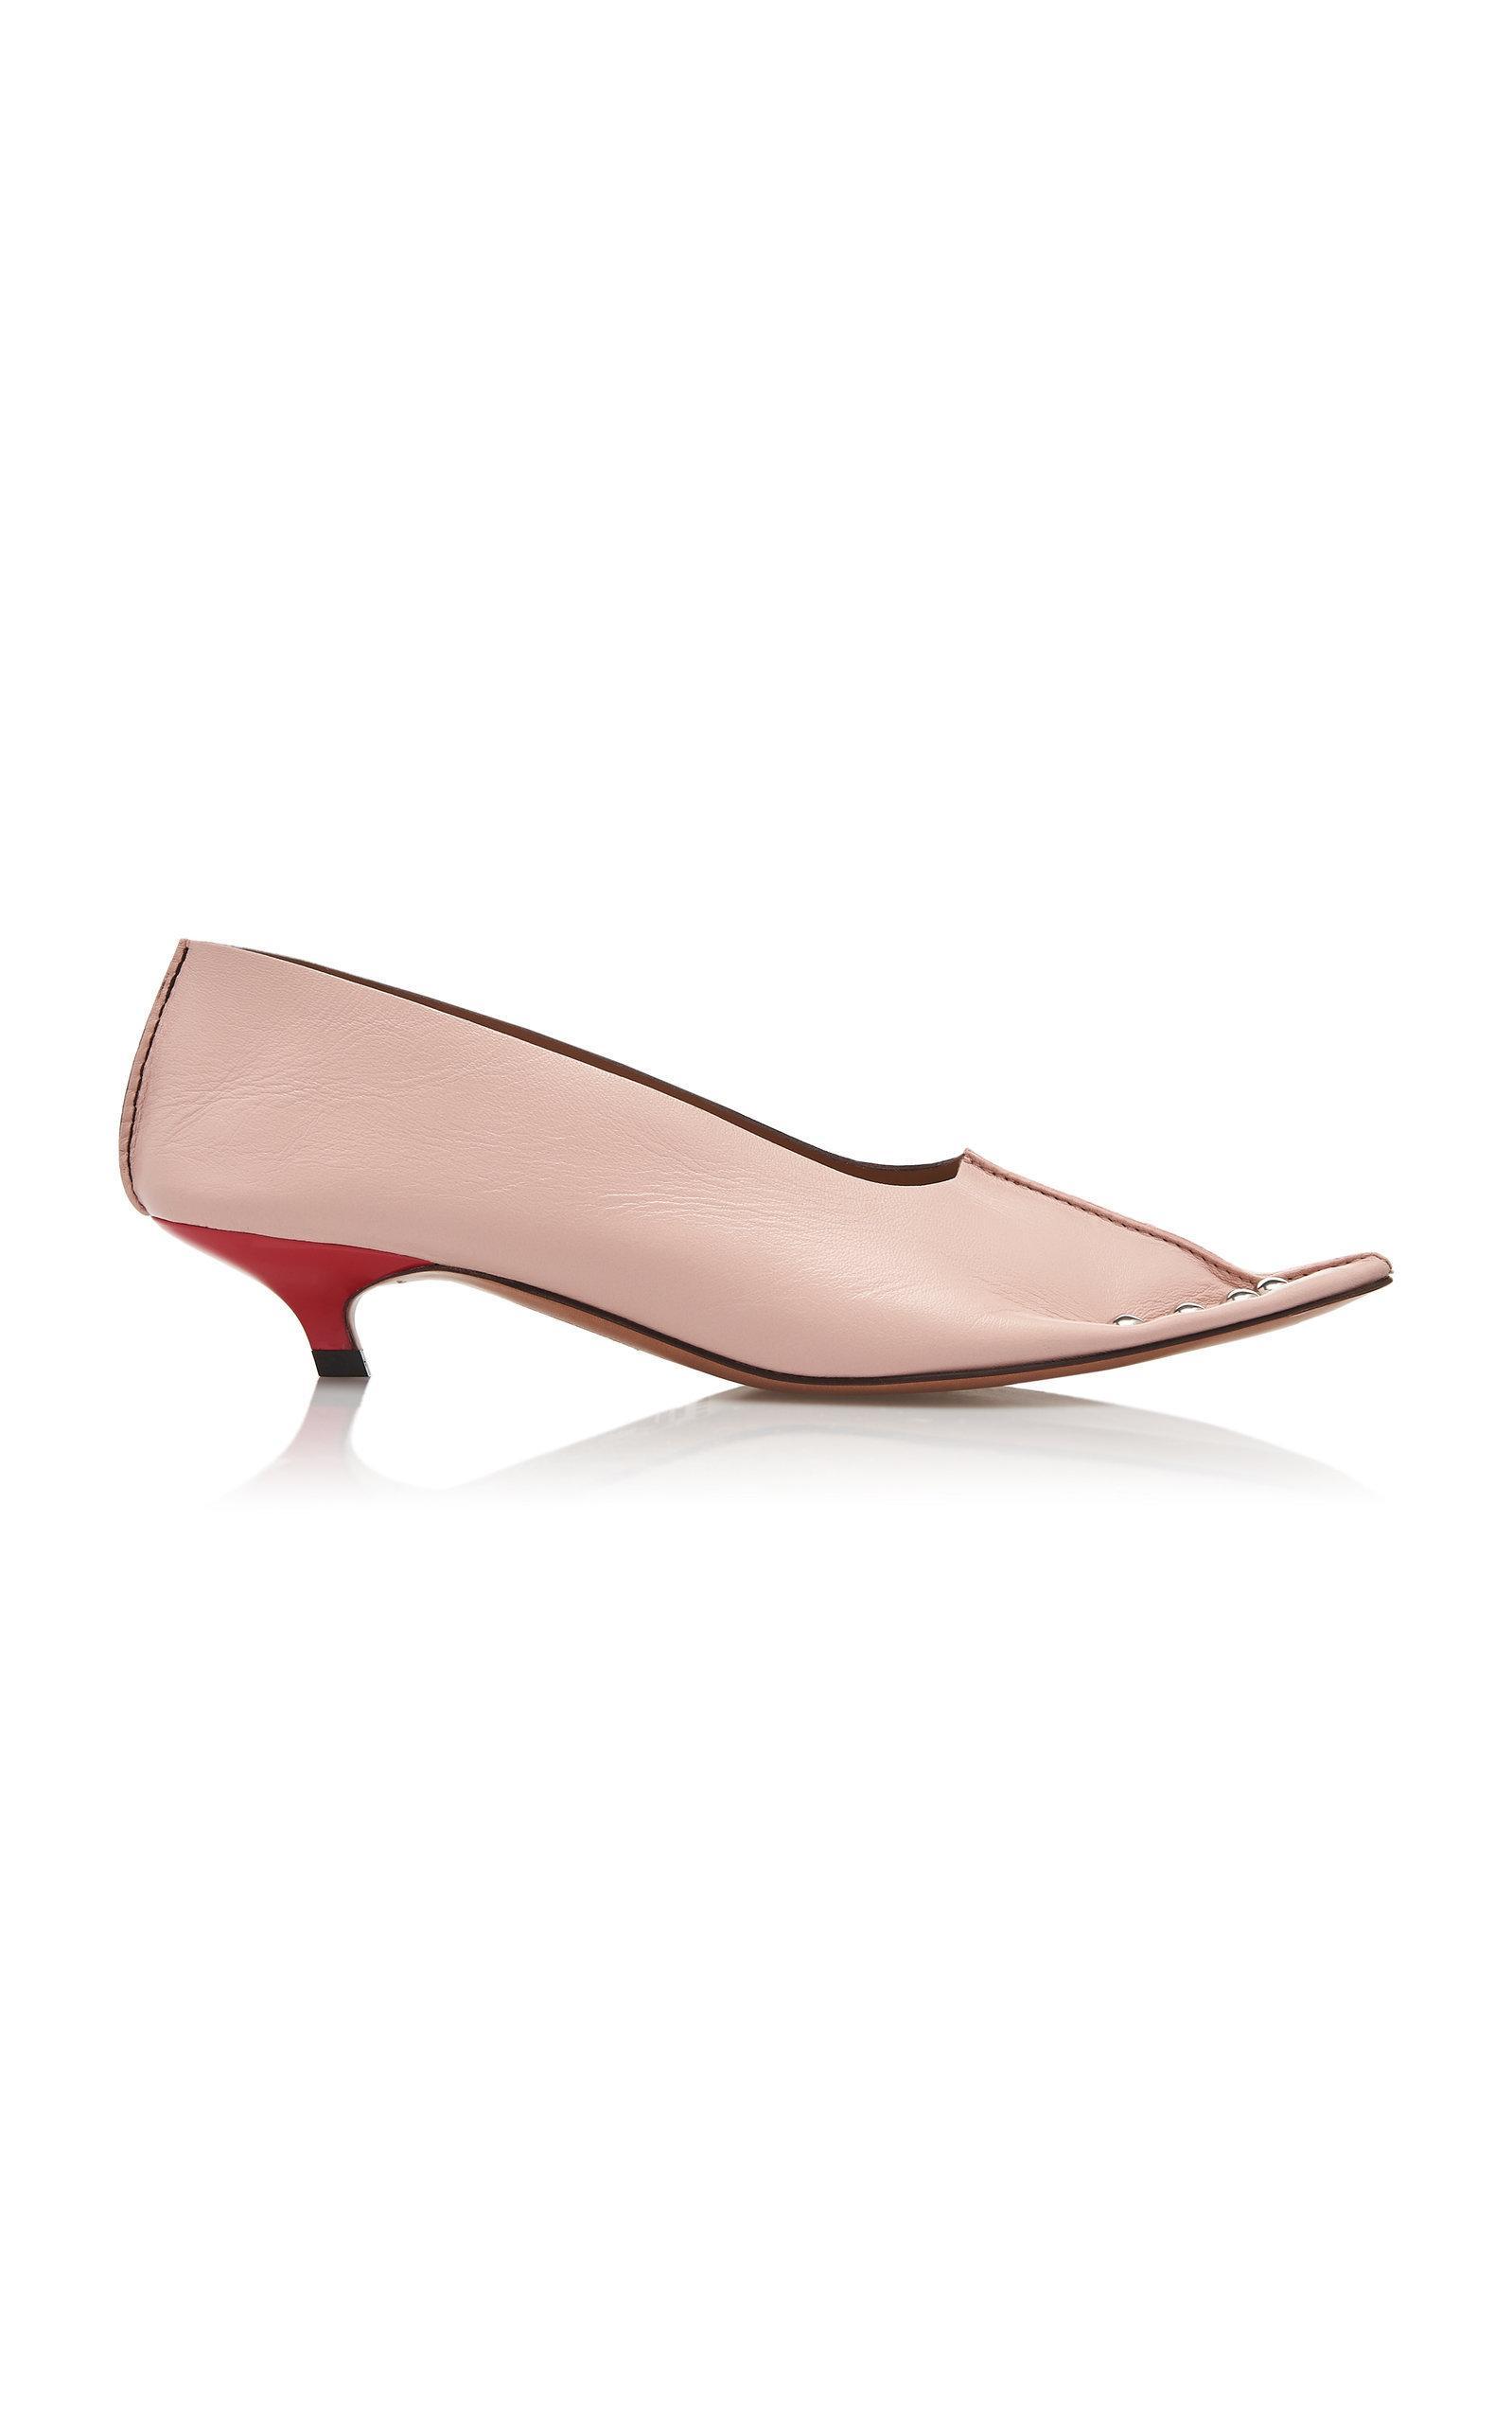 3fded04e9f86 Marni Studded Low-Heel Pumps In Pink. Moda Operandi